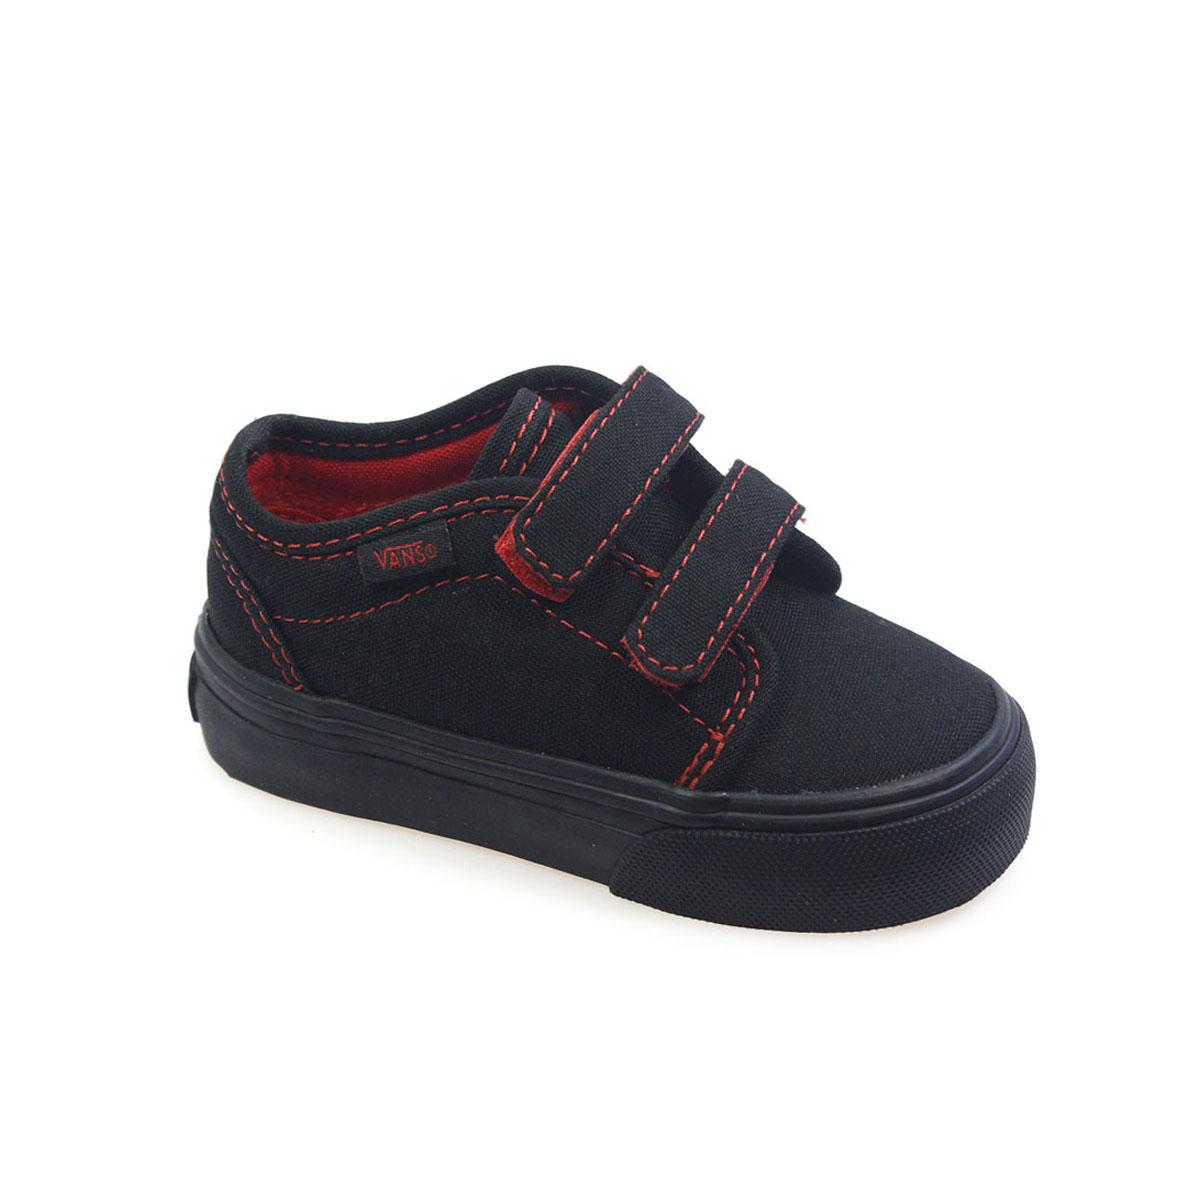 Vans Black Velcro Shoes Uk